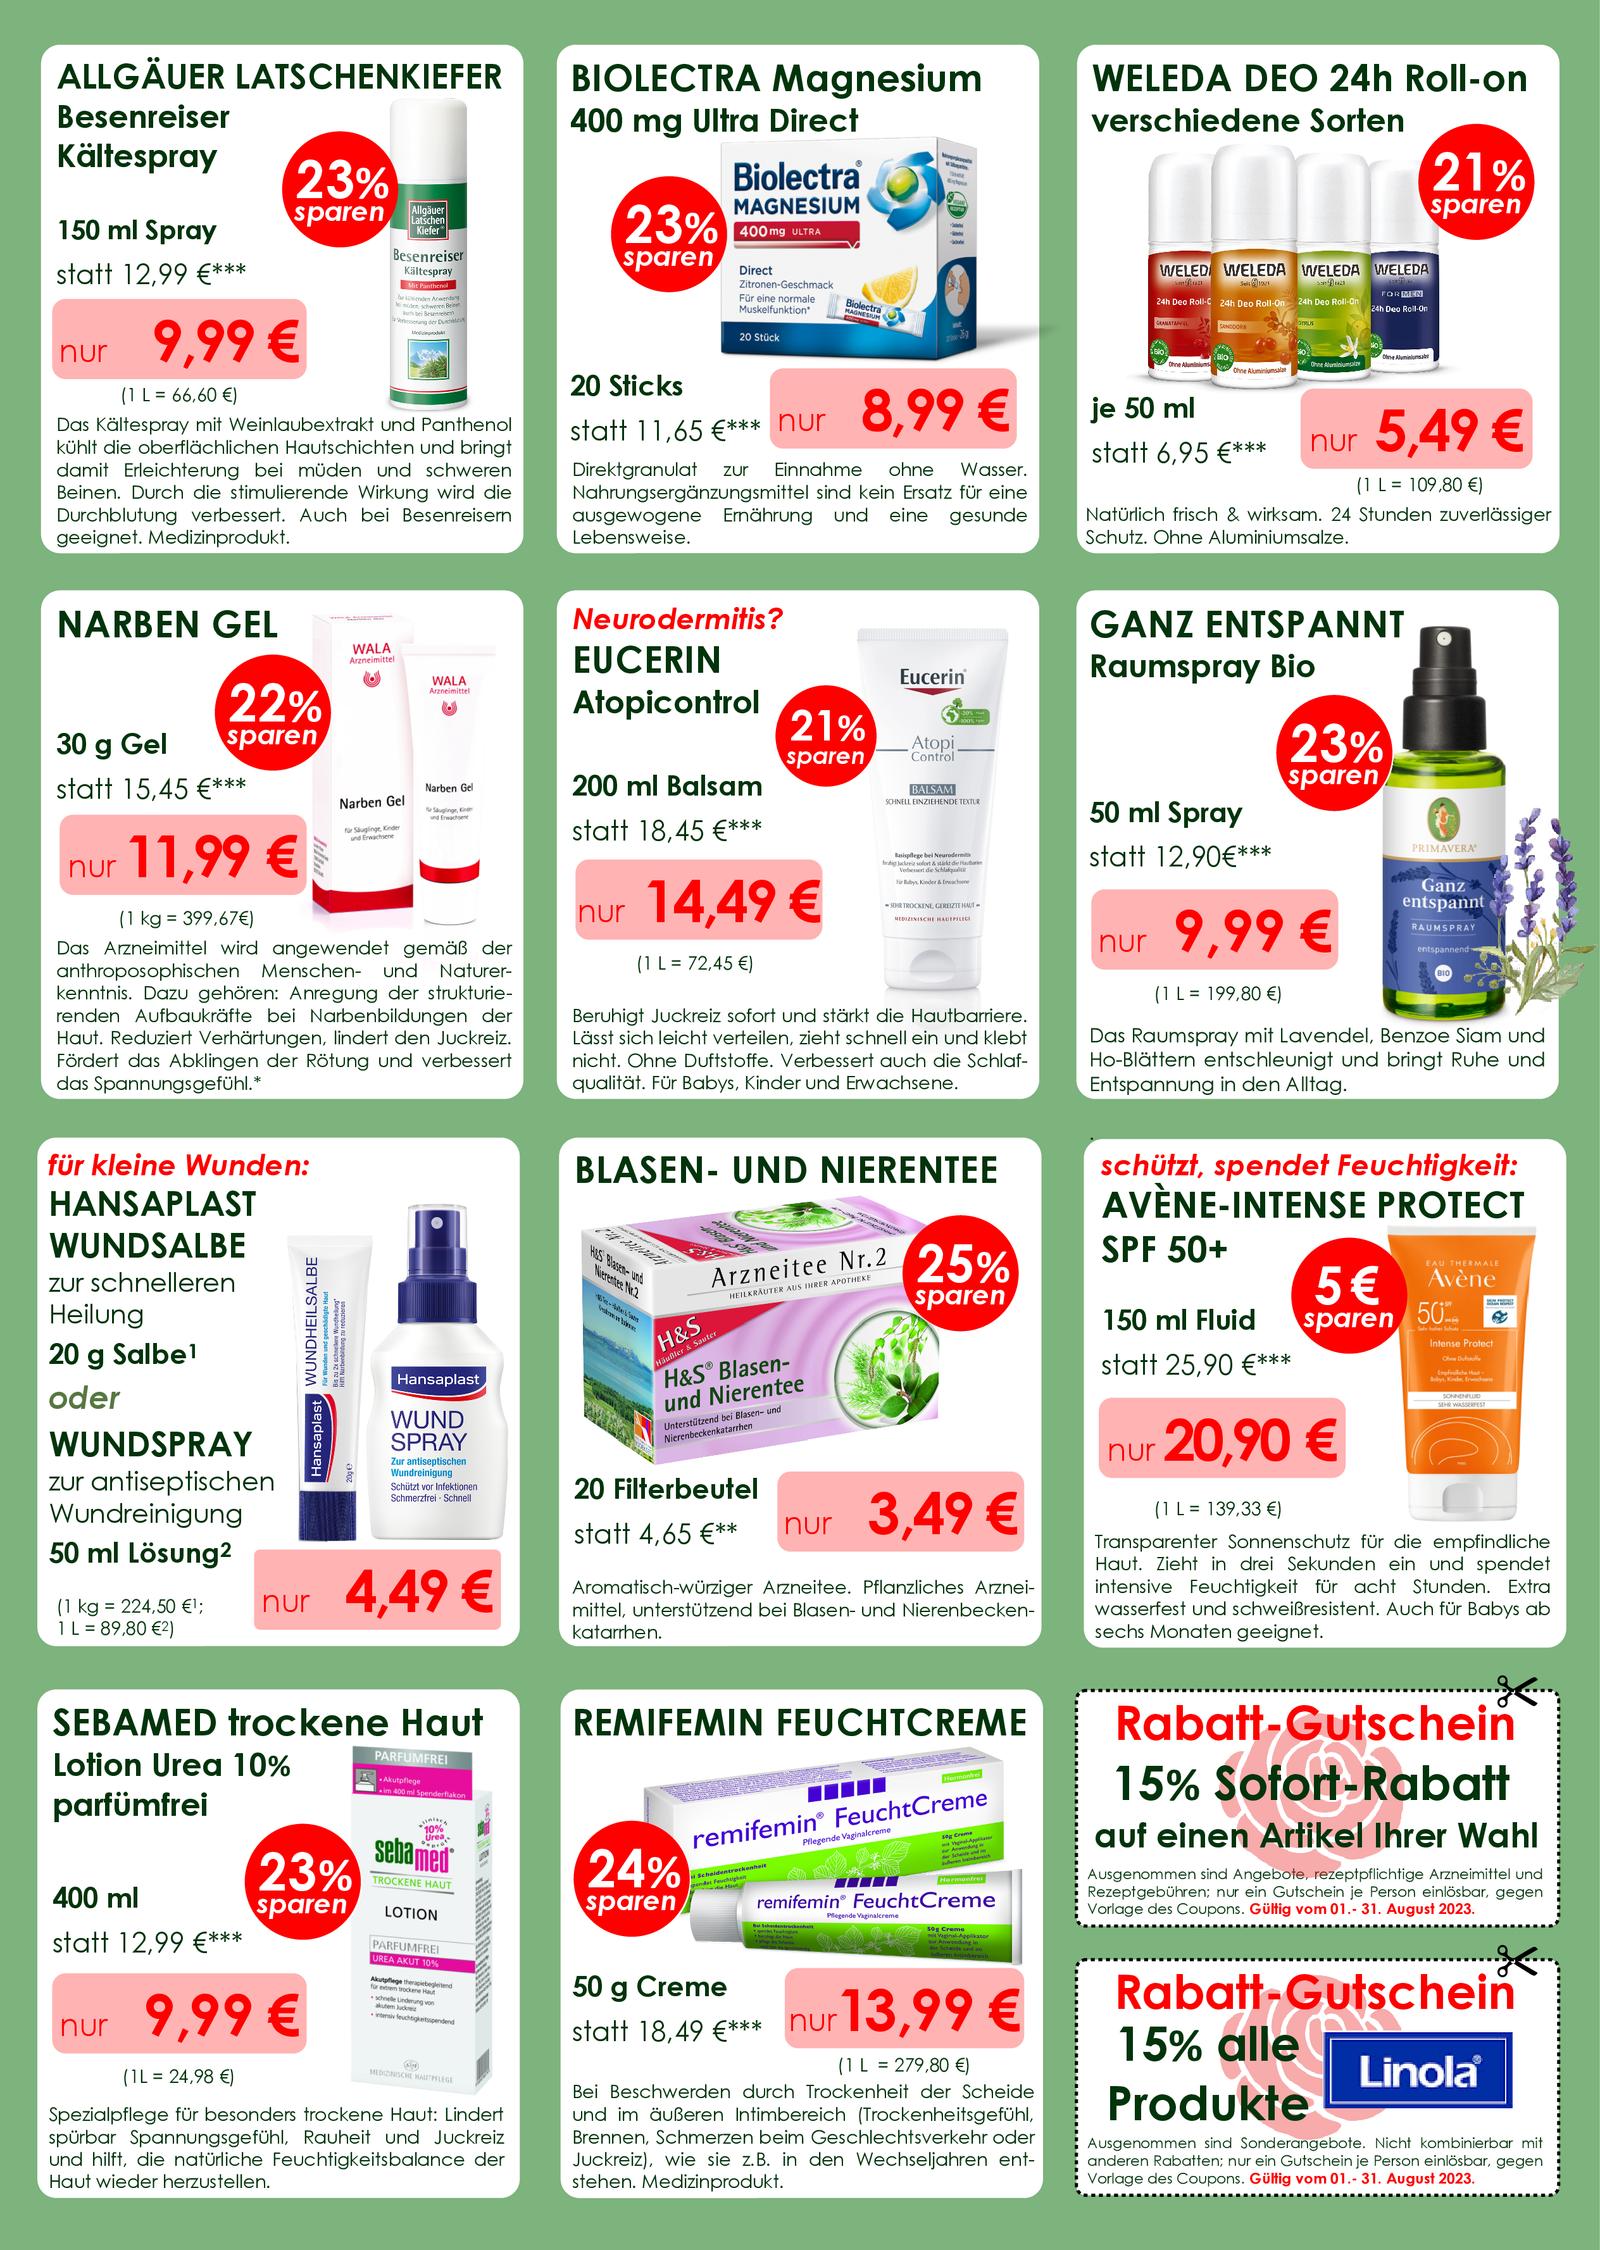 https://mein-uploads.apocdn.net/5184/leaflets/5184_flyer-Seite2.png